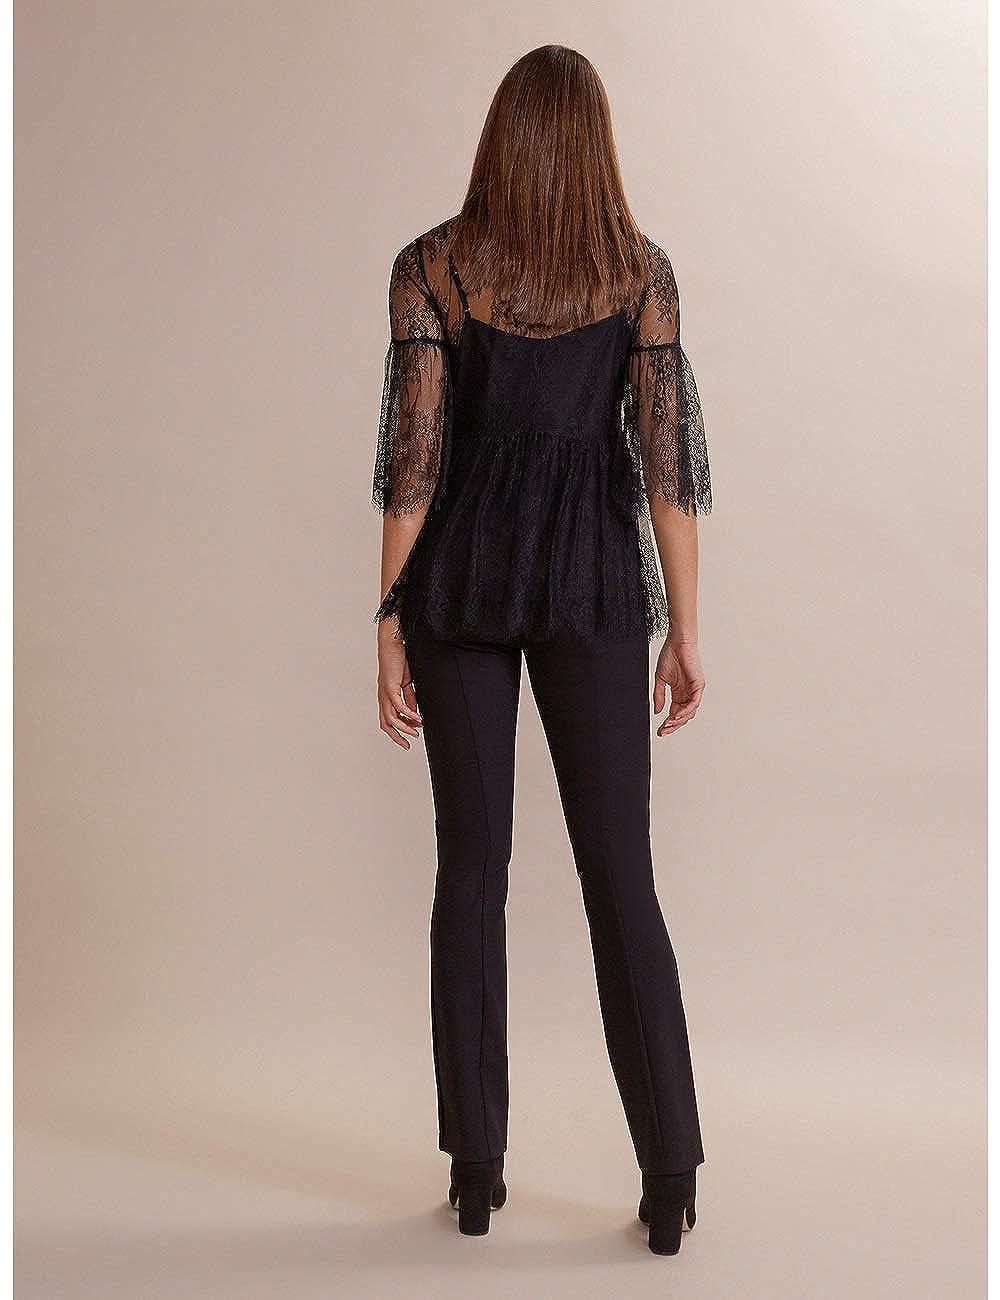 Italian Size Pantaloni Regular con Banda in Velluto Oltre